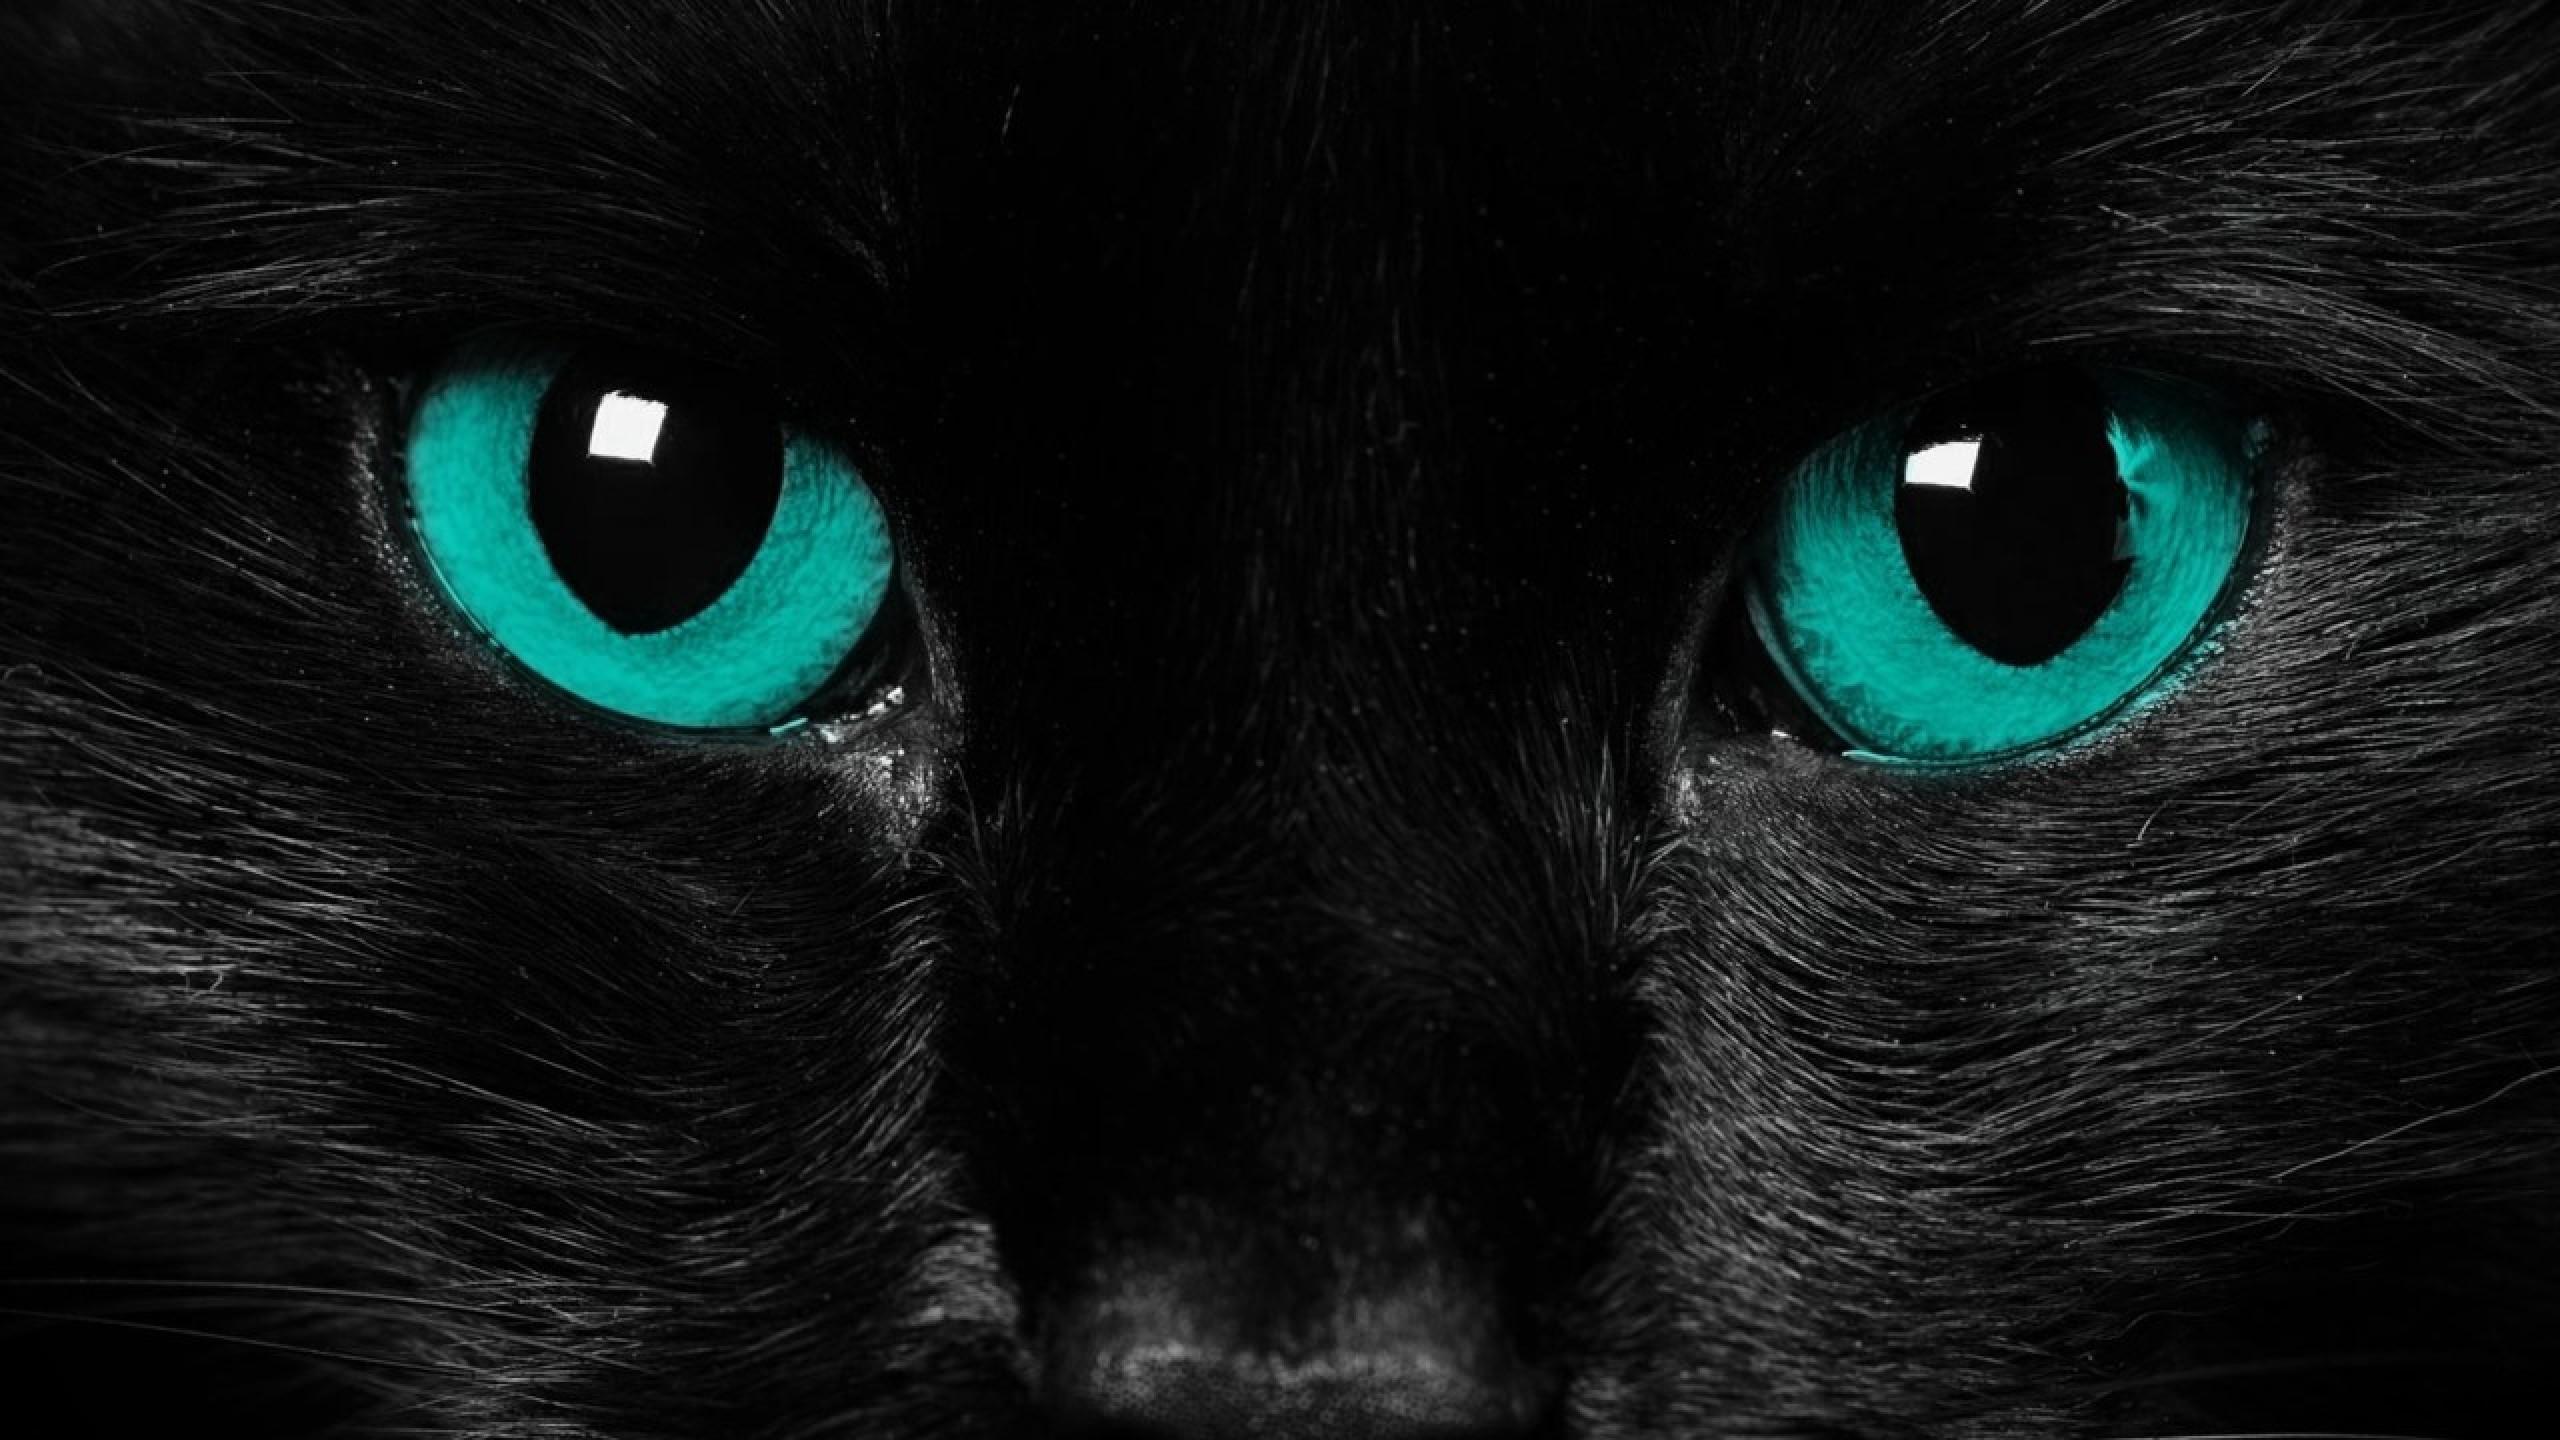 Wallpaper eyes, black cat, close-up